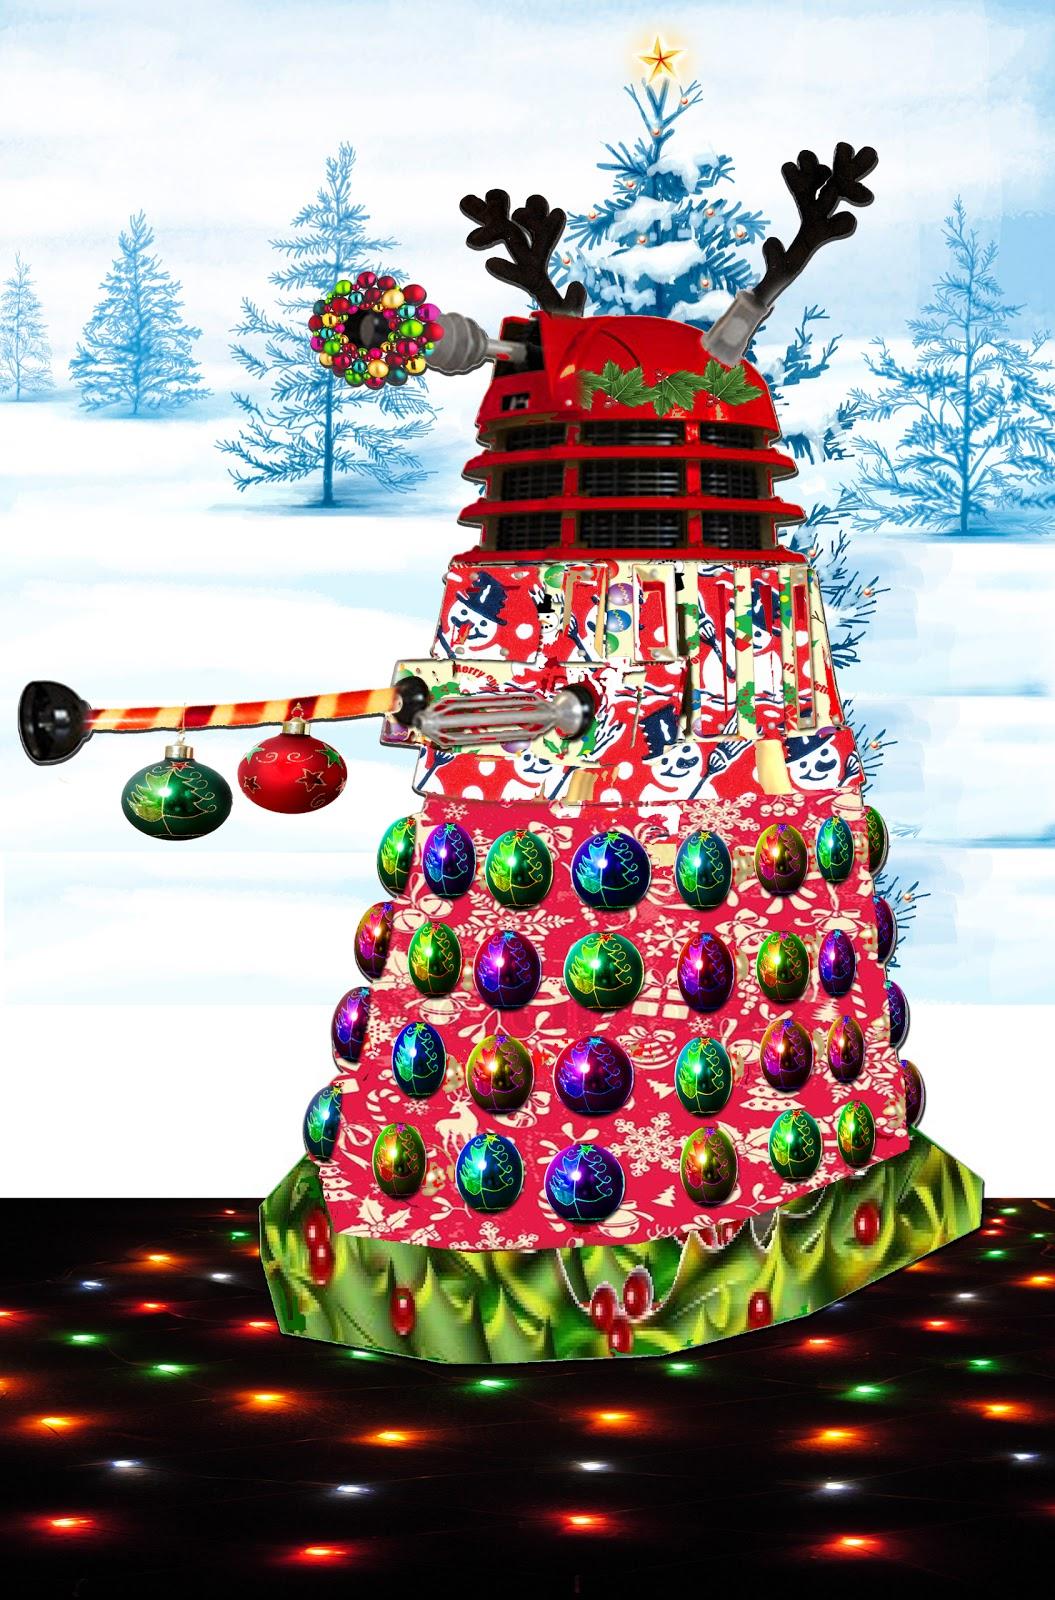 Found A Stick: The Christmas Dalek